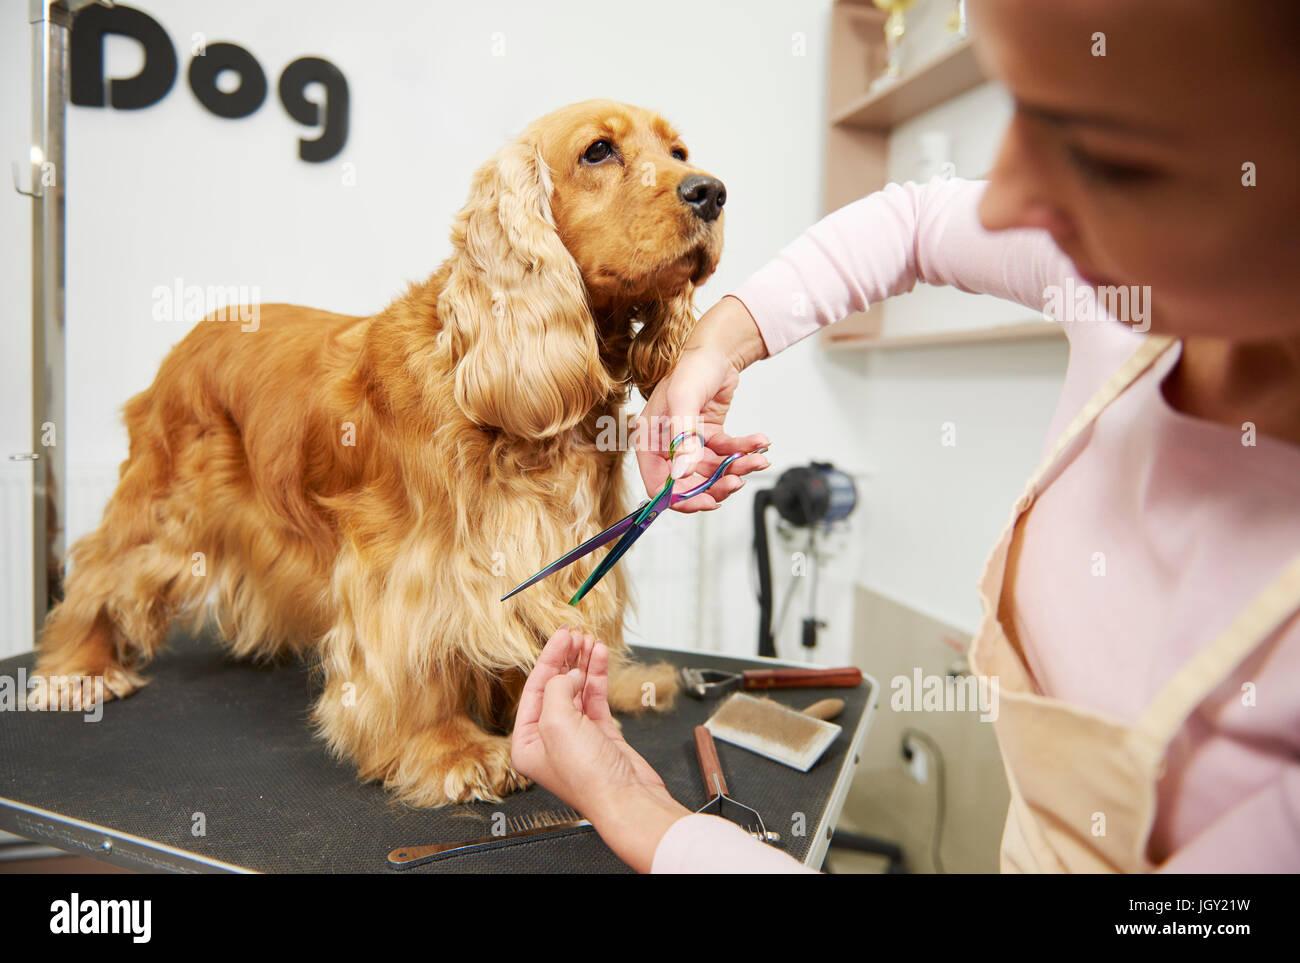 Female groomer trimming cocker spaniel at dog grooming salon - Stock Image